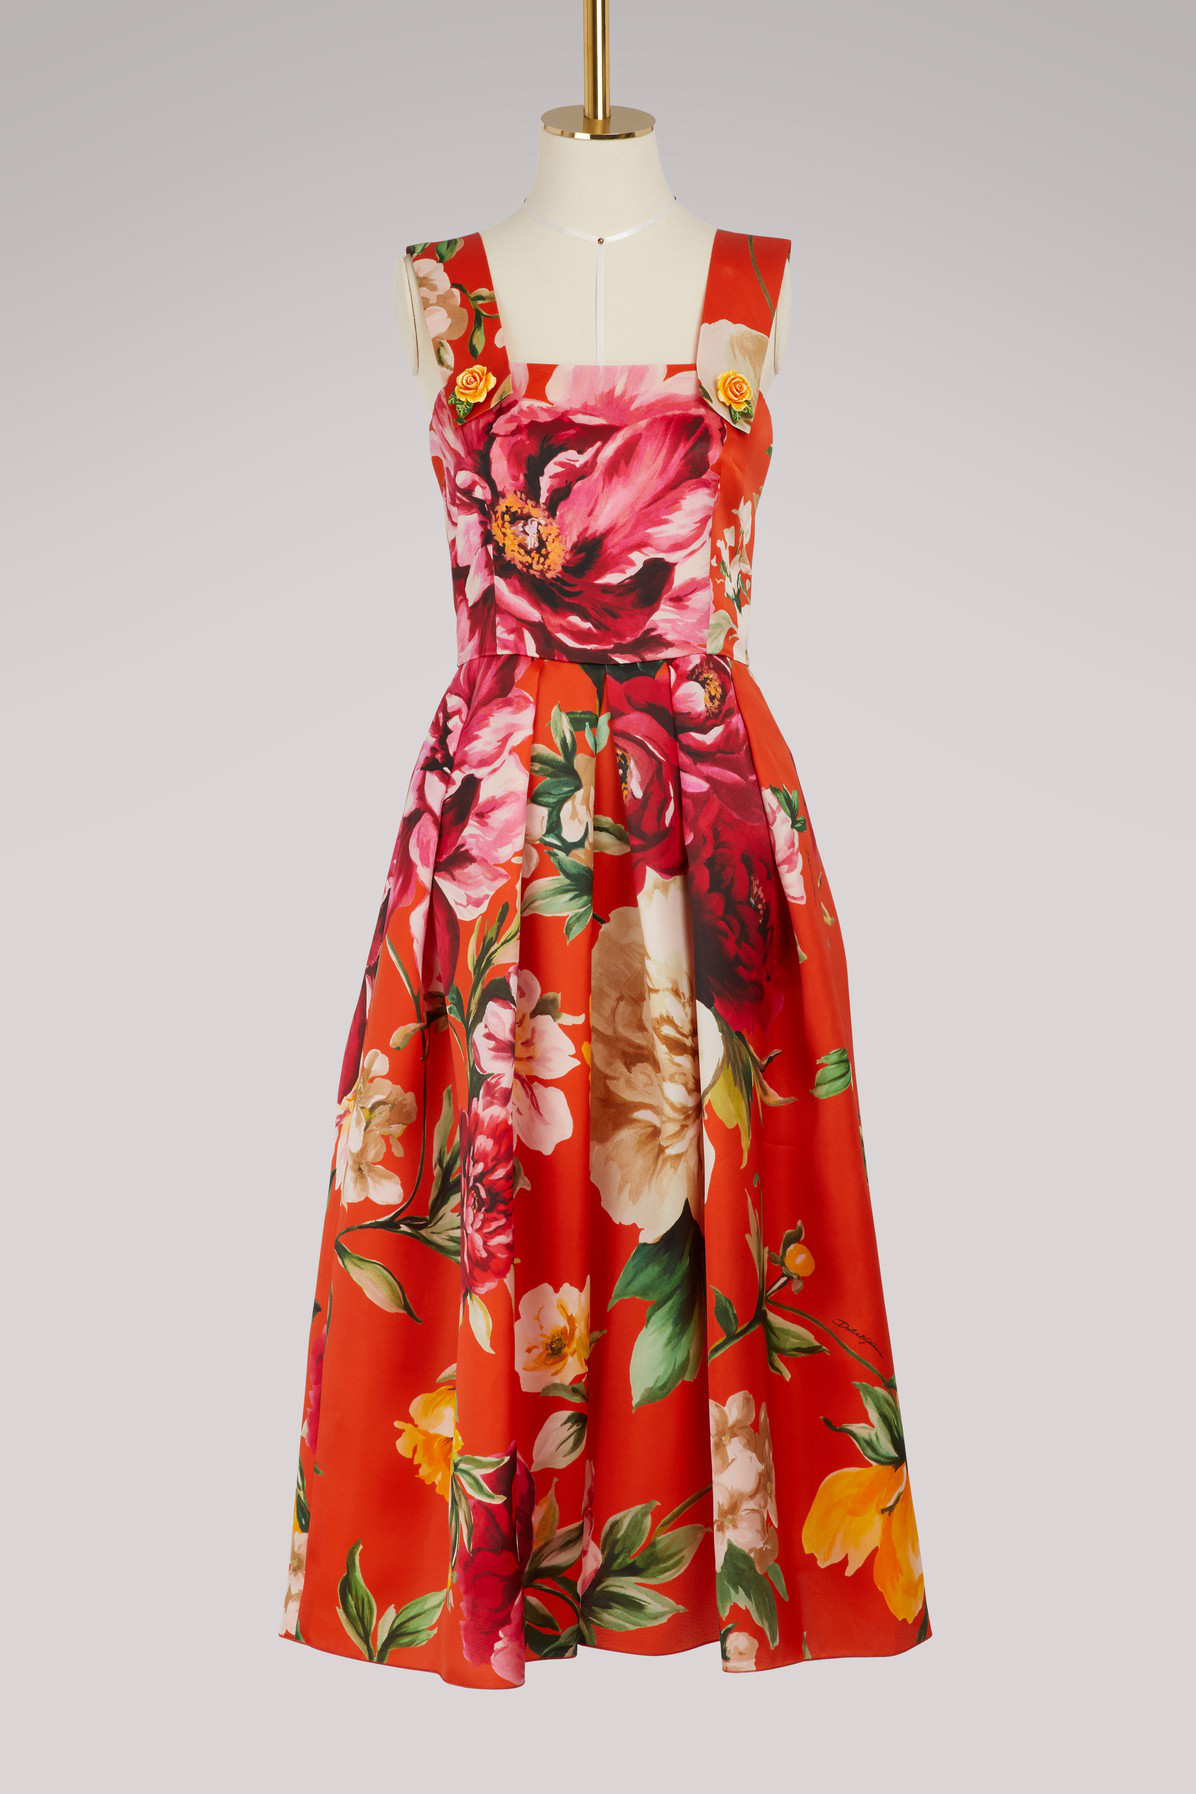 Dolce & Gabbana Flowers Maxi Dress In Orange